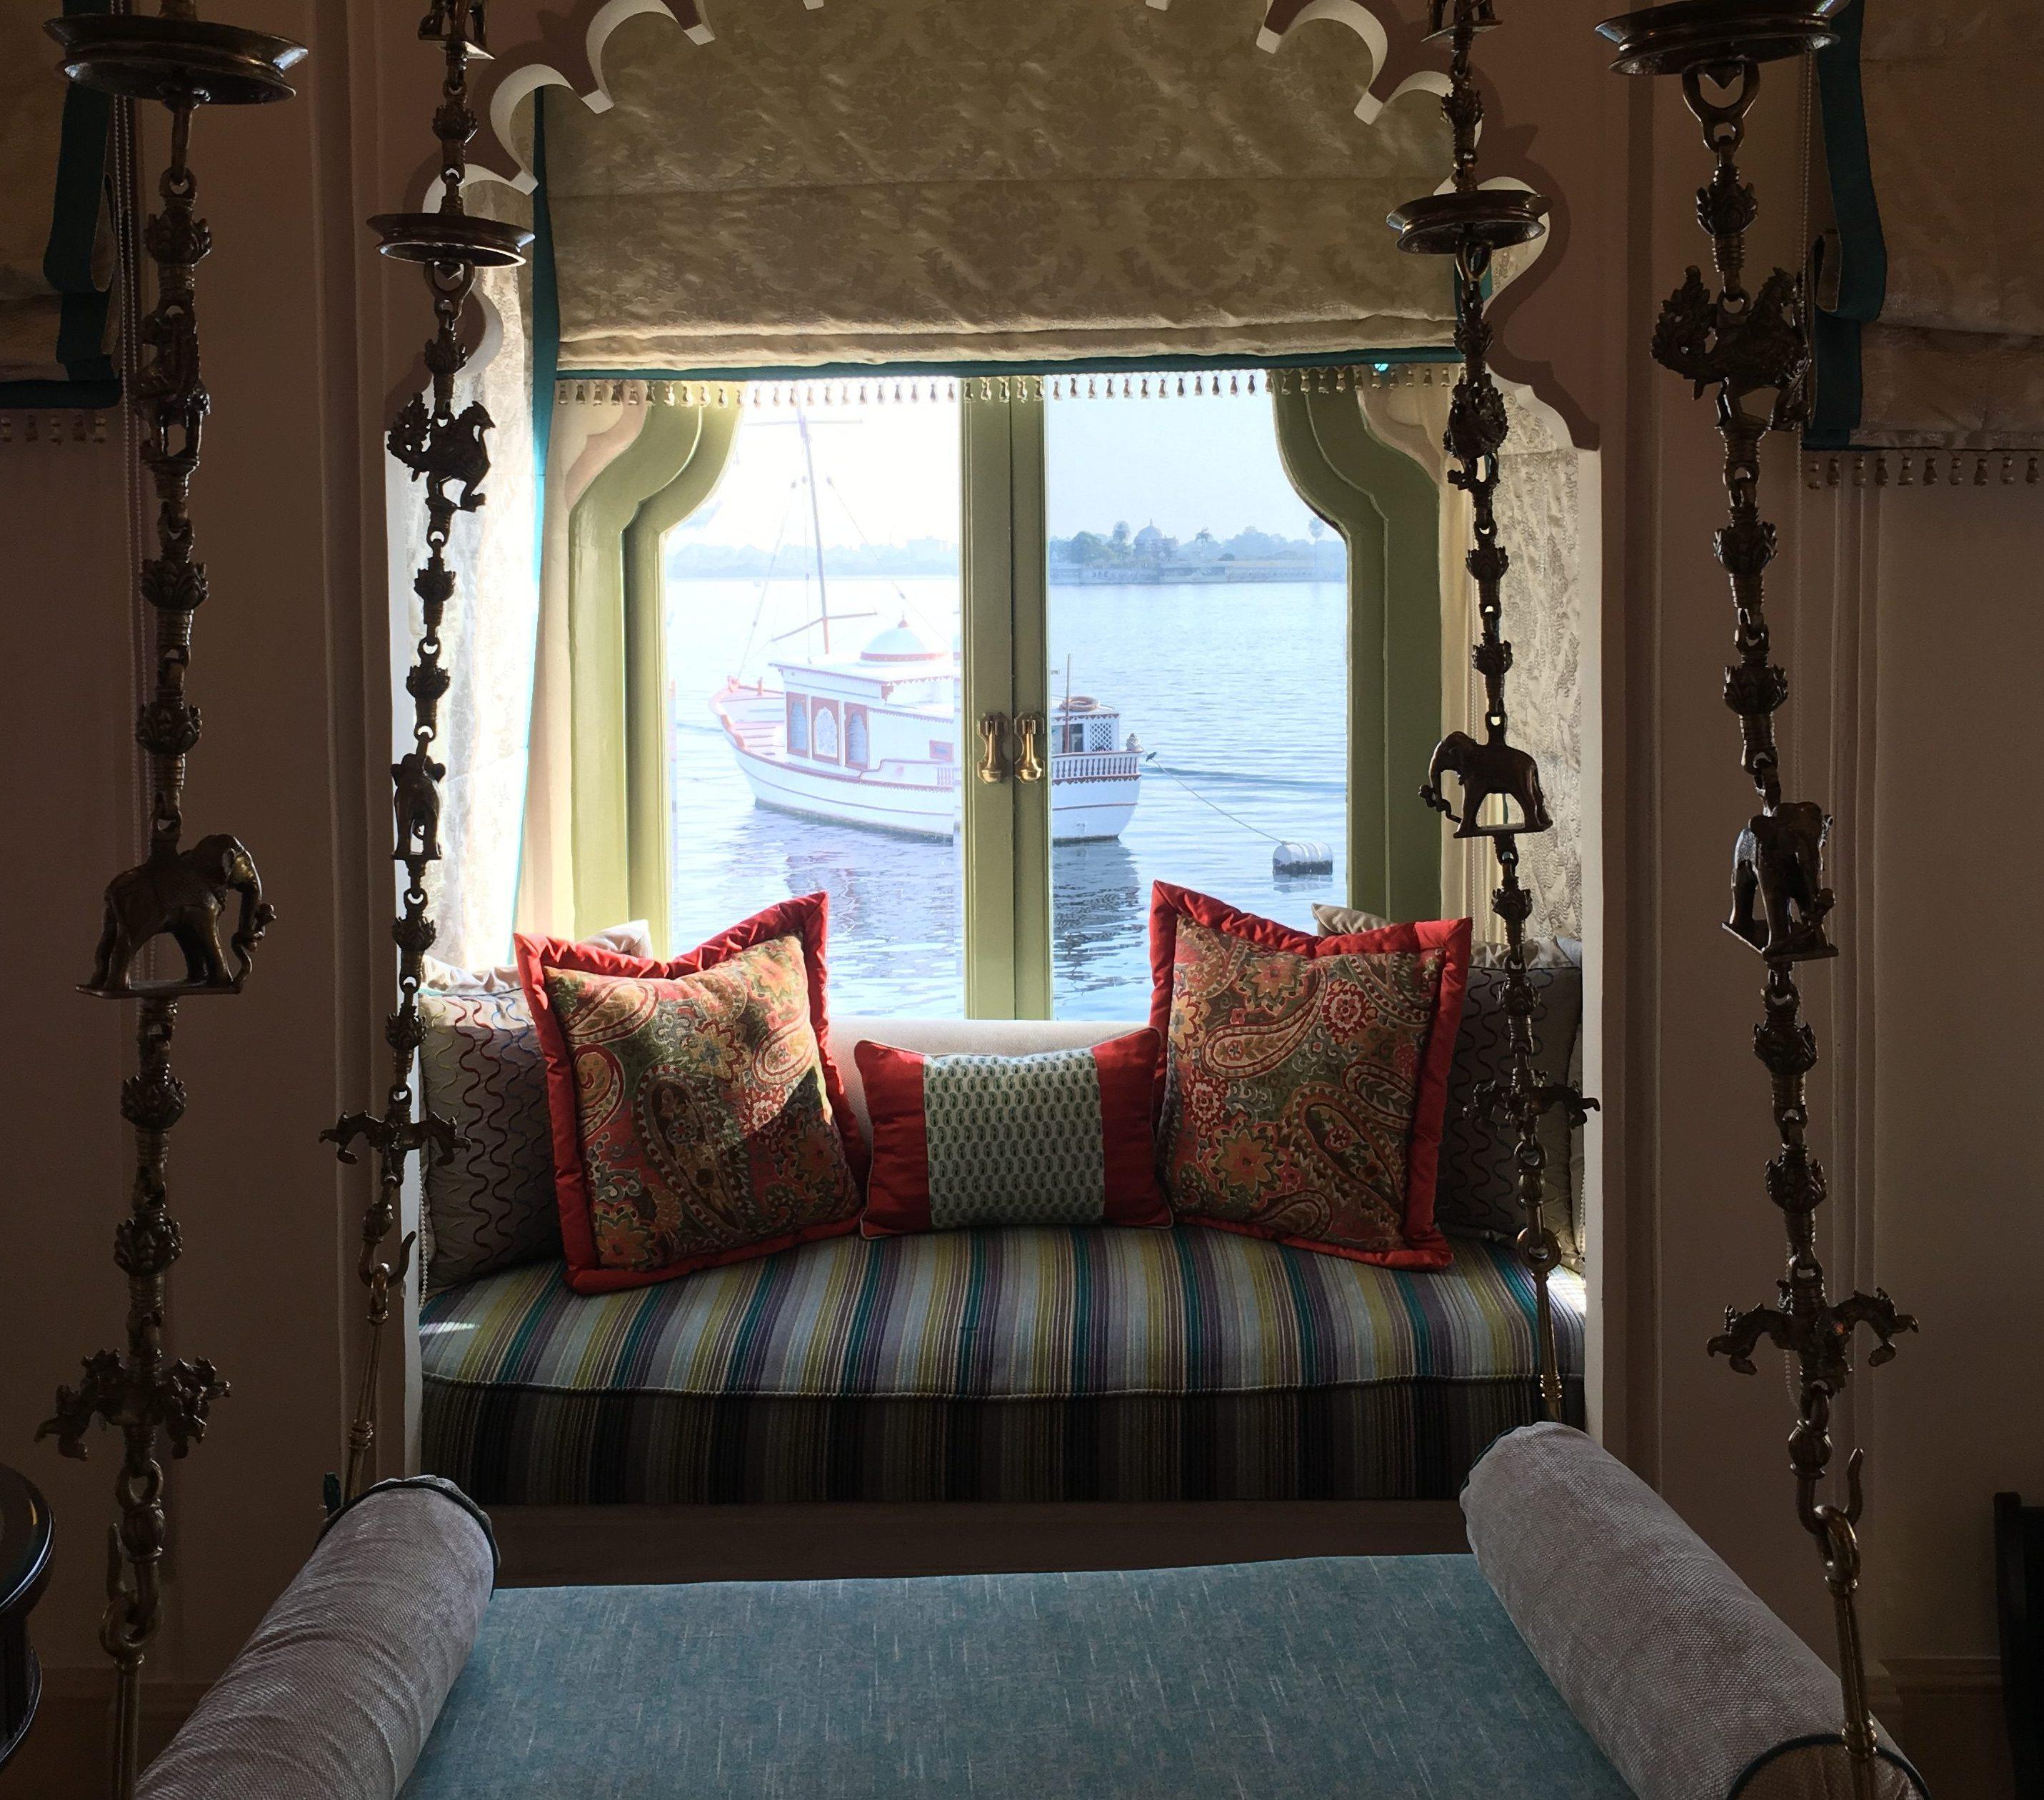 @exotiktraveler's cover photo for 'The legendary suites at Taj Lake Palace, Udaipur by ExotikTraveler'